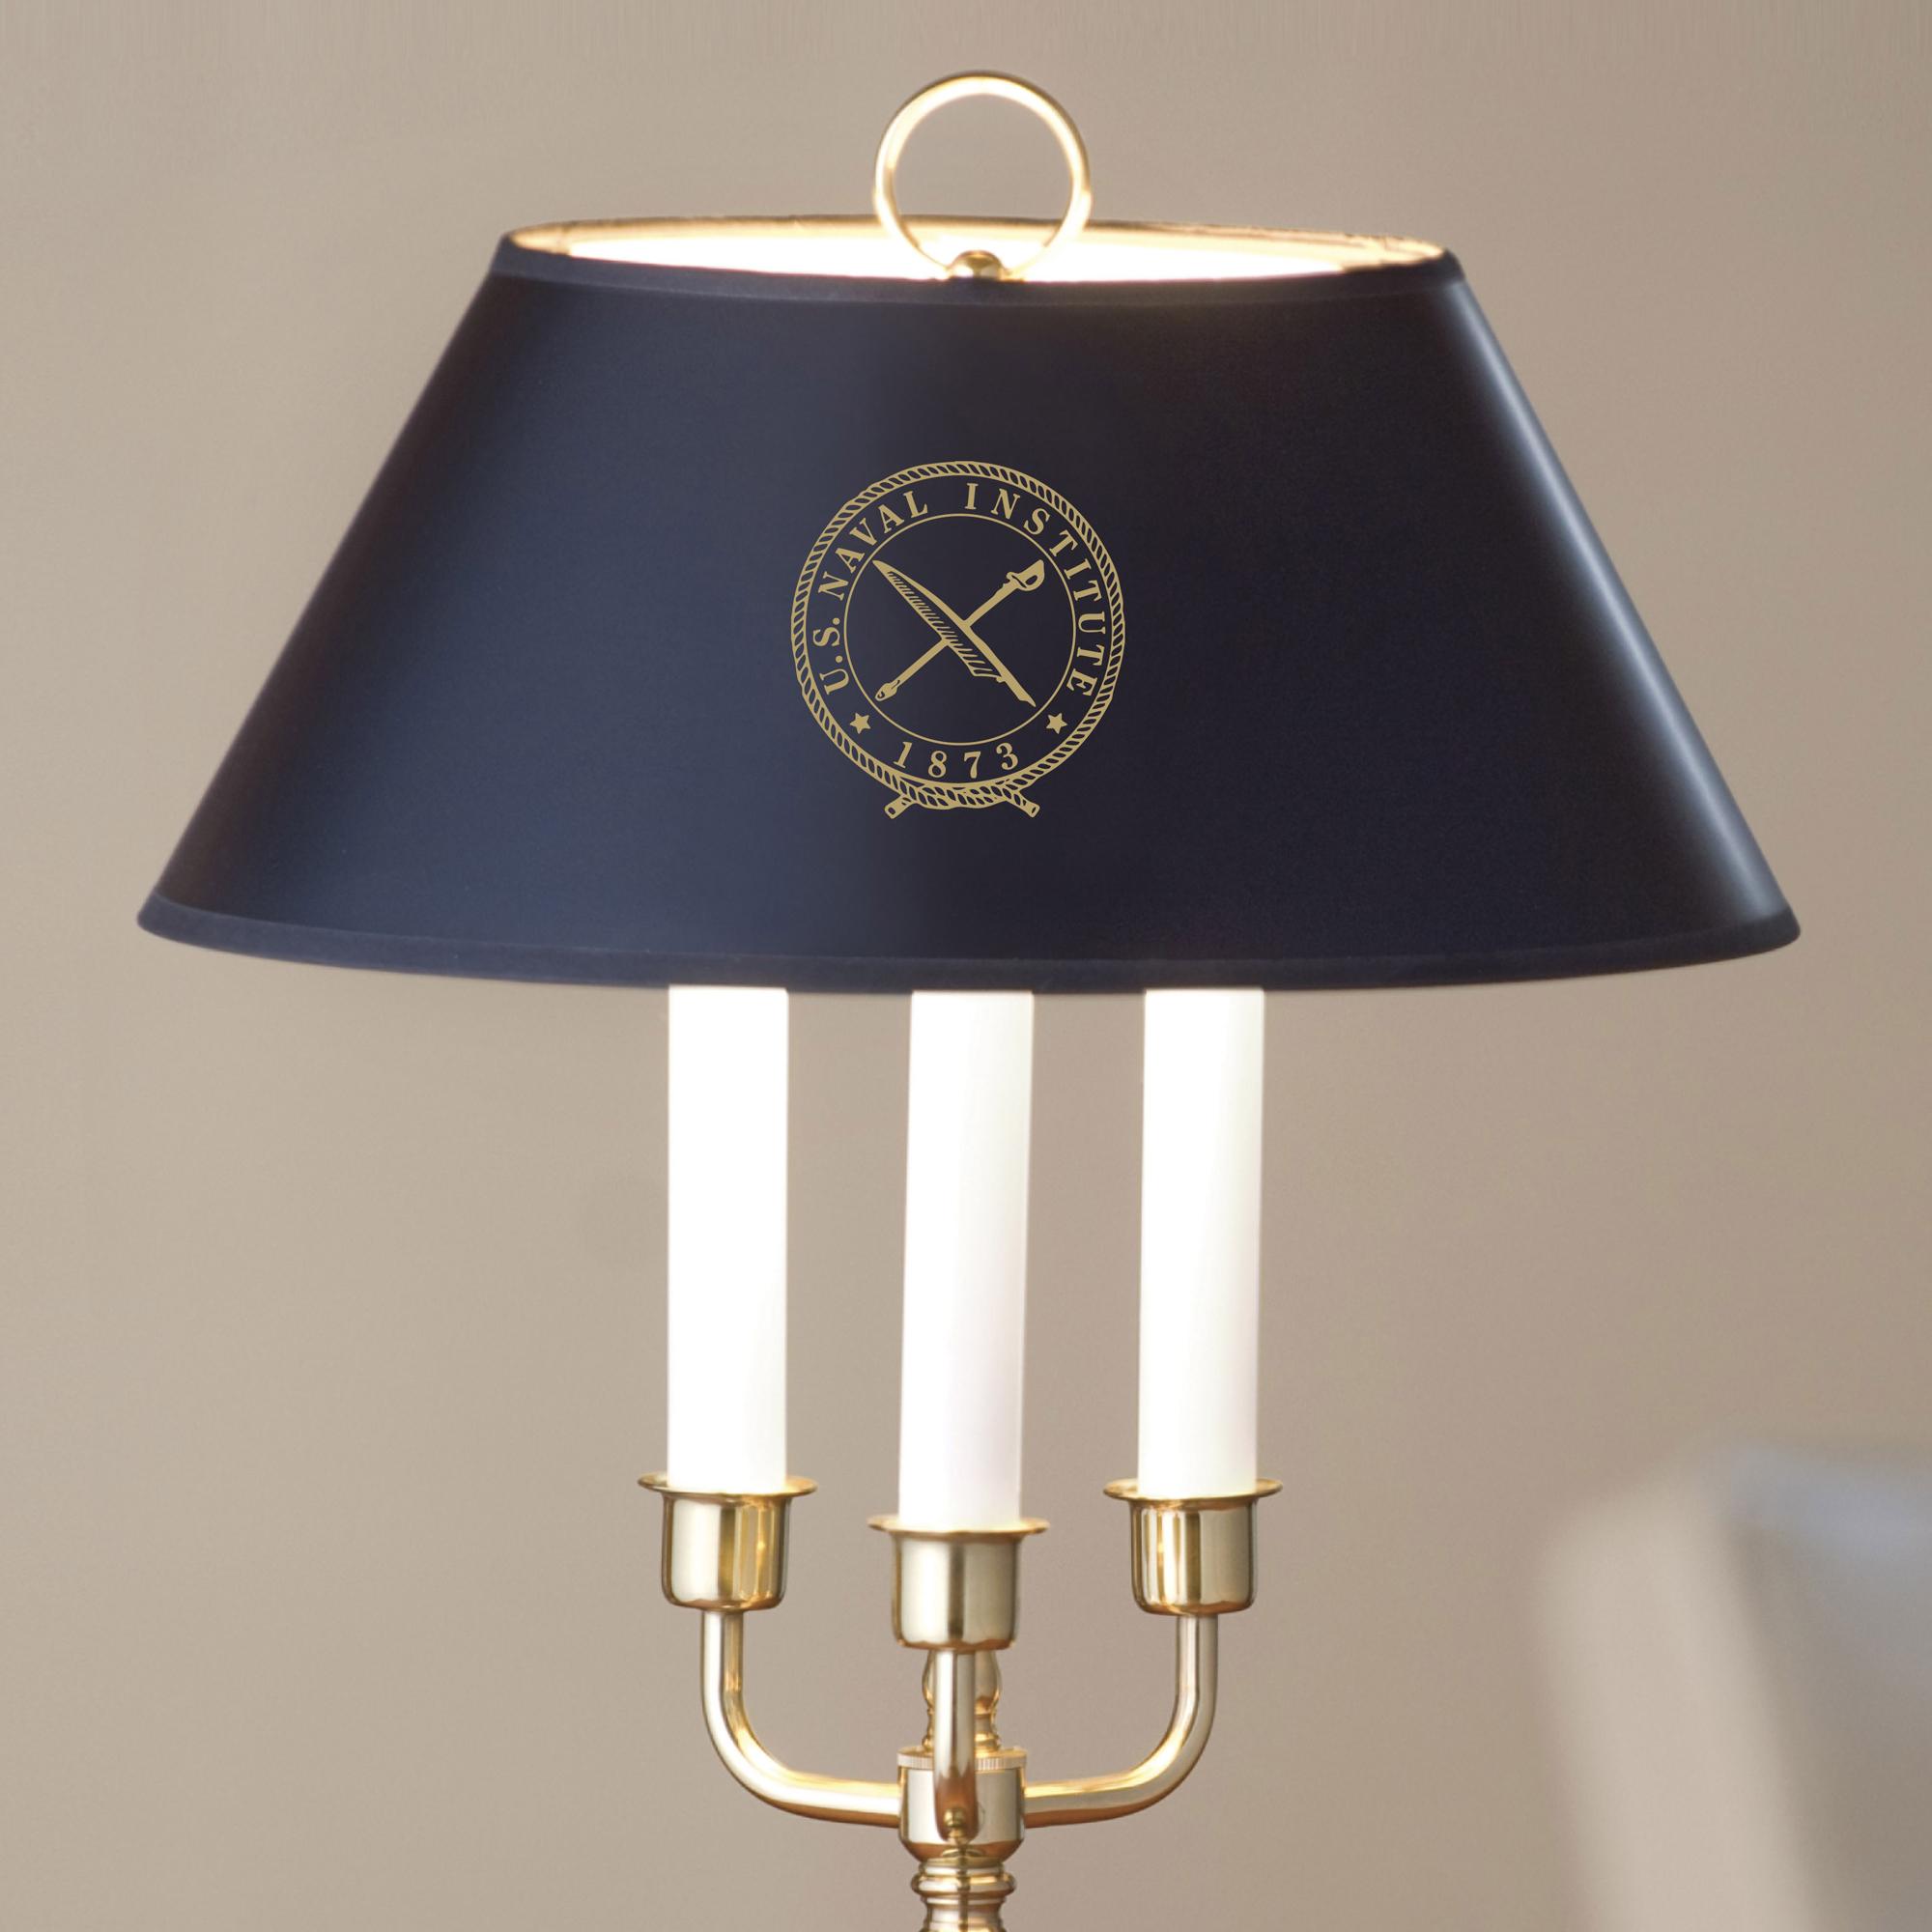 U.S. Naval Institute Lamp in Brass & Marble - Image 2